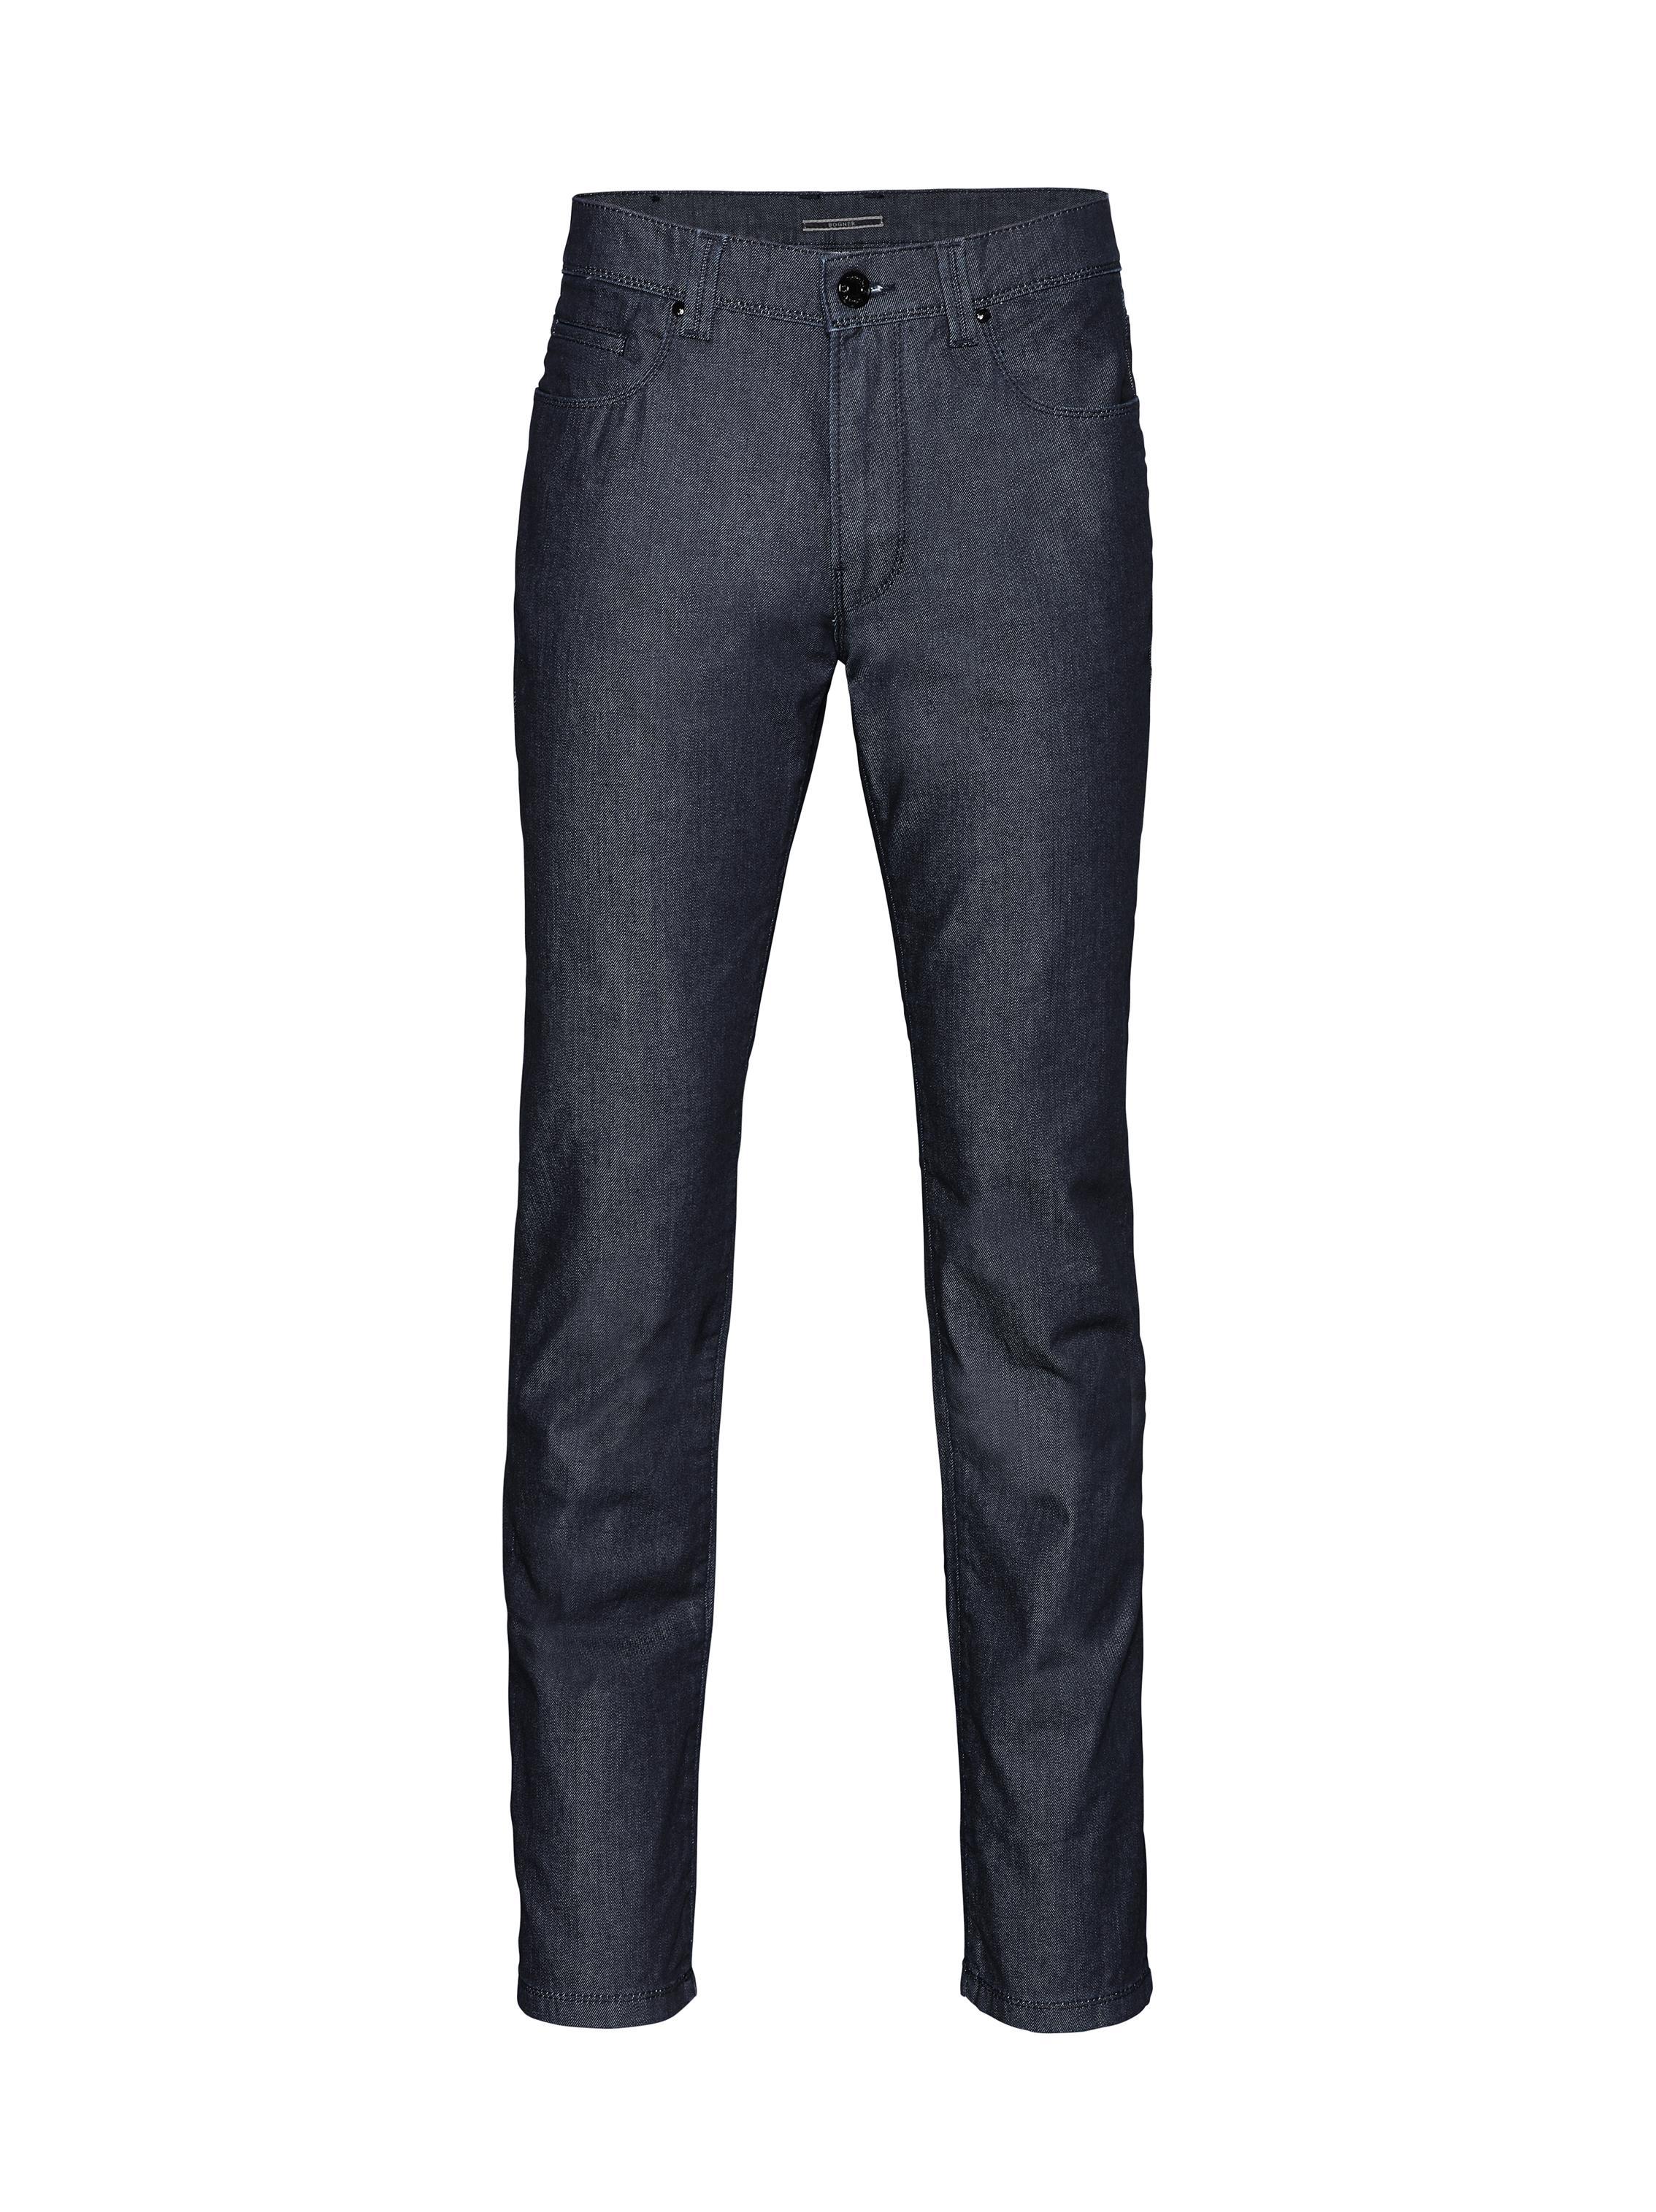 Bogner Water-repellent Jeans Idaho in Blue for Men